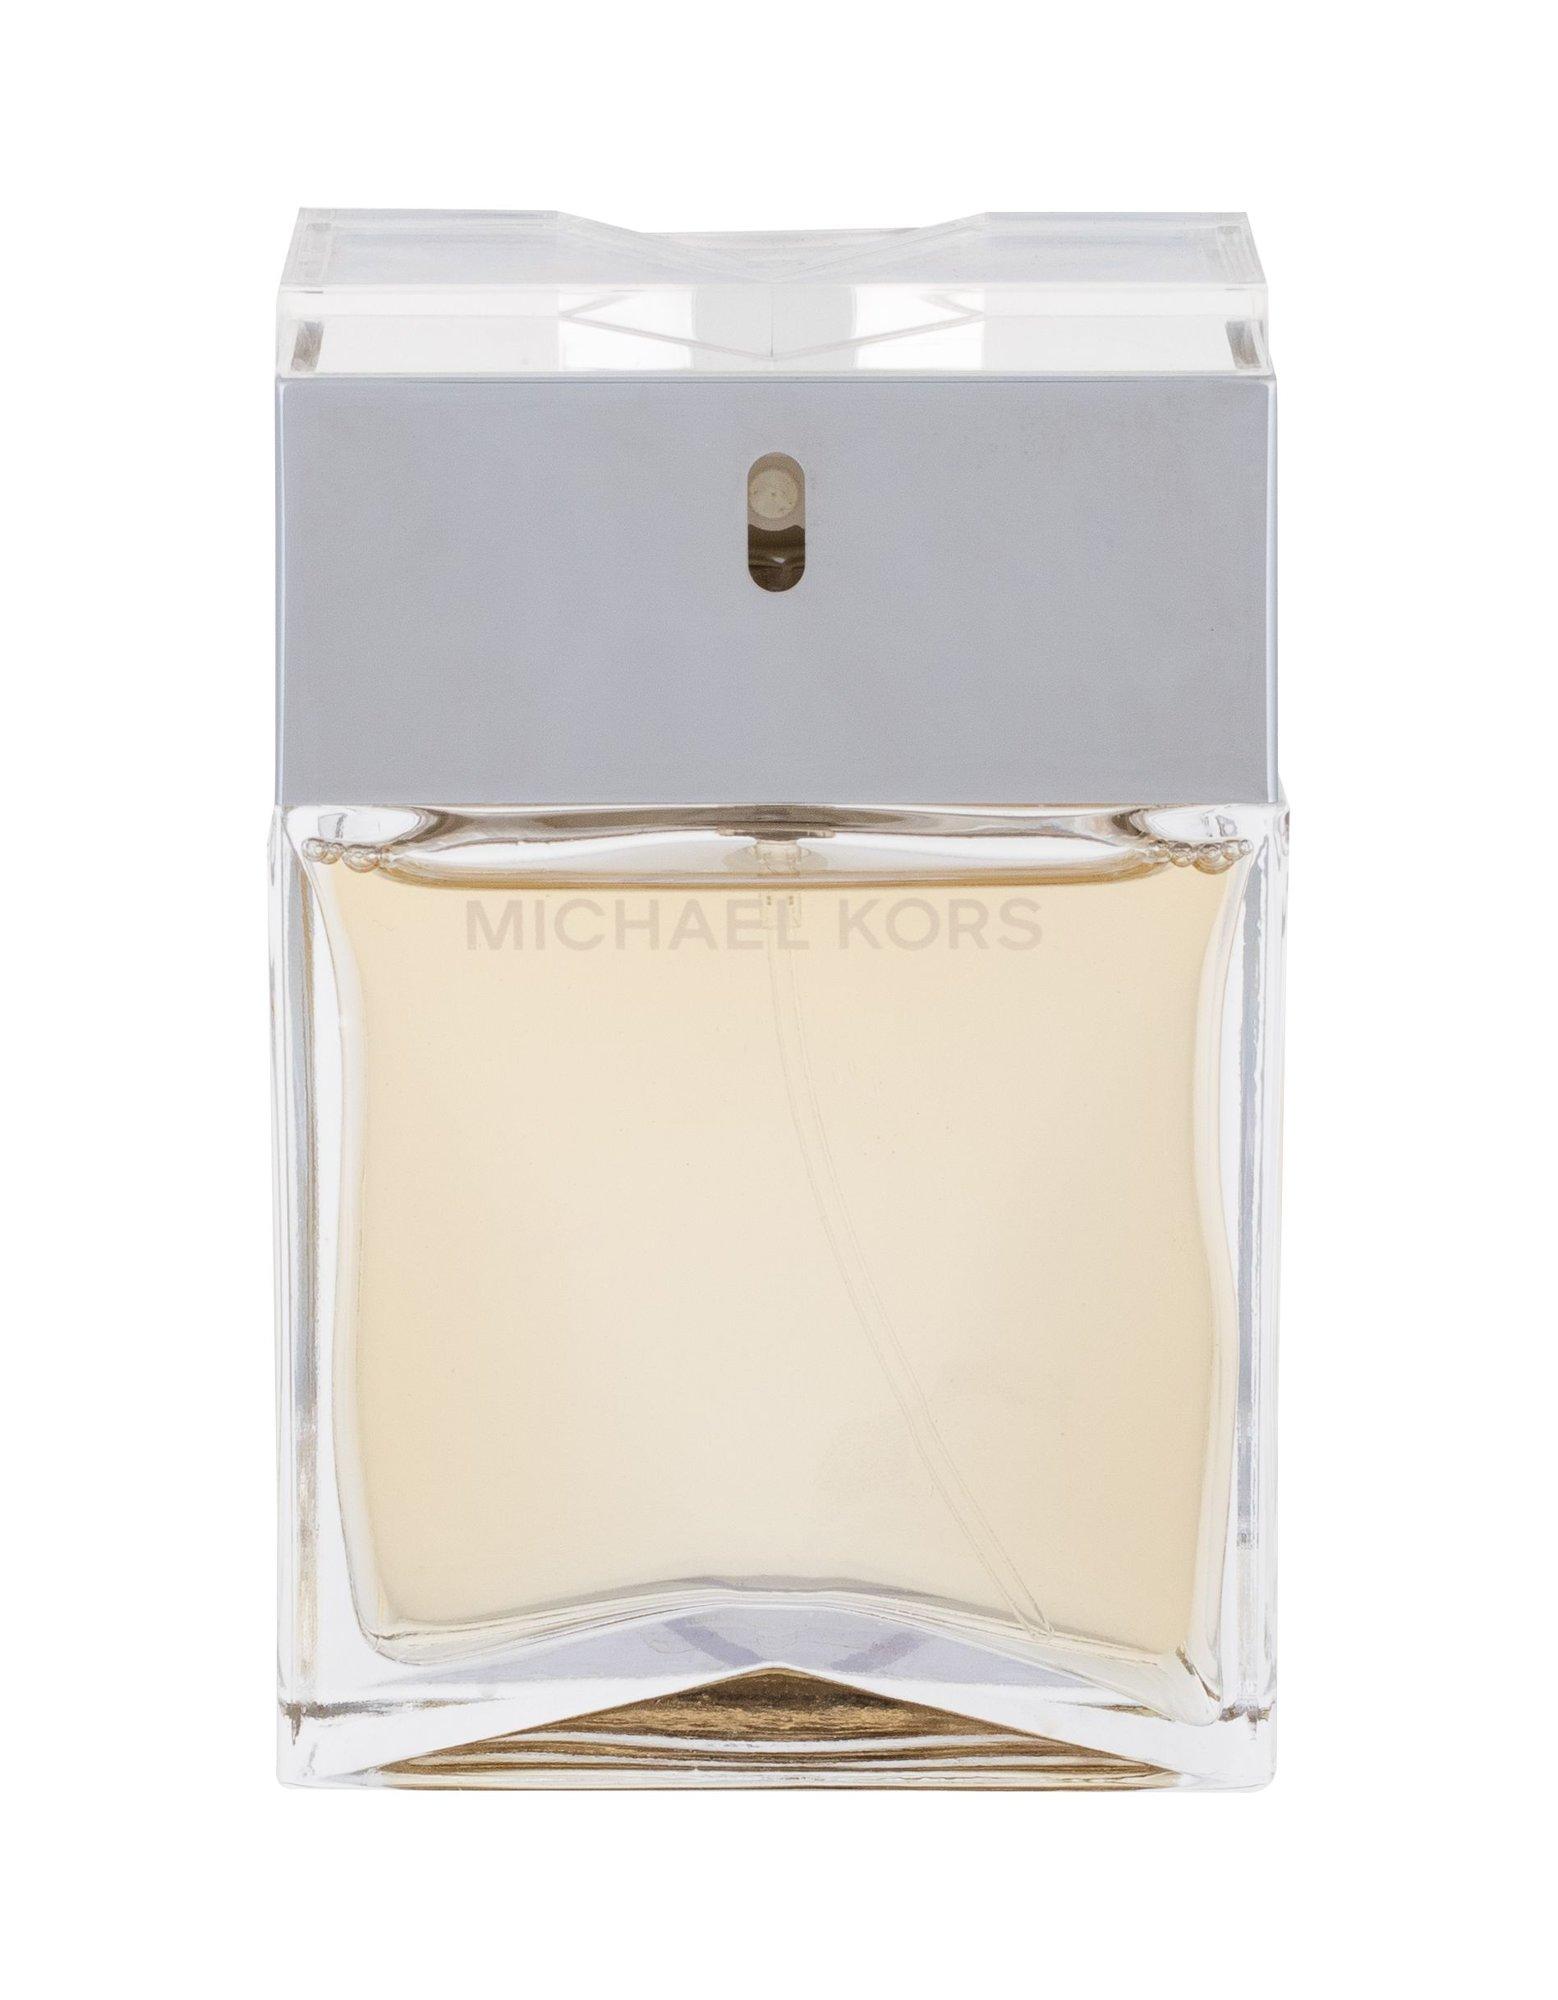 Michael Kors Michael Kors Eau de Parfum 50ml